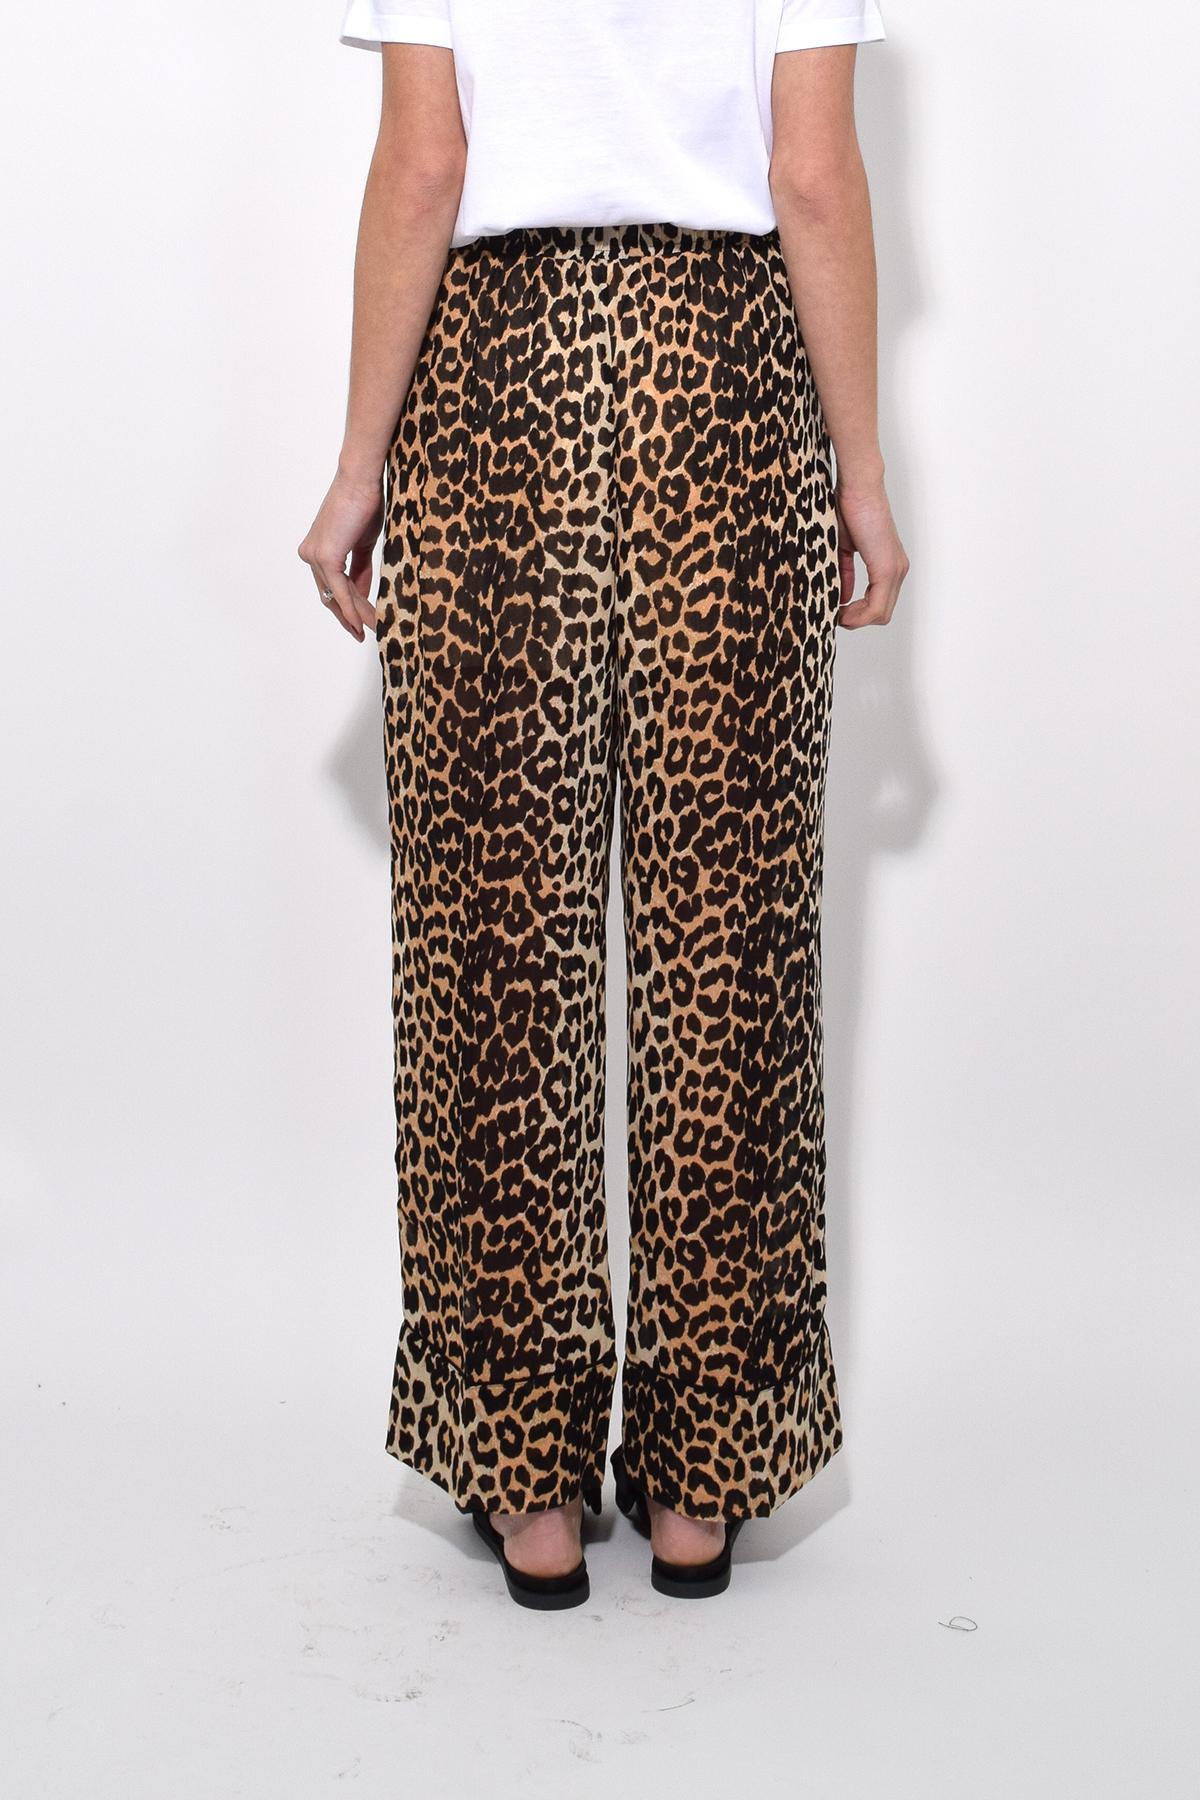 24b0dc41 Ganni Fairfax Georgette Pants In Leopard - Lyst